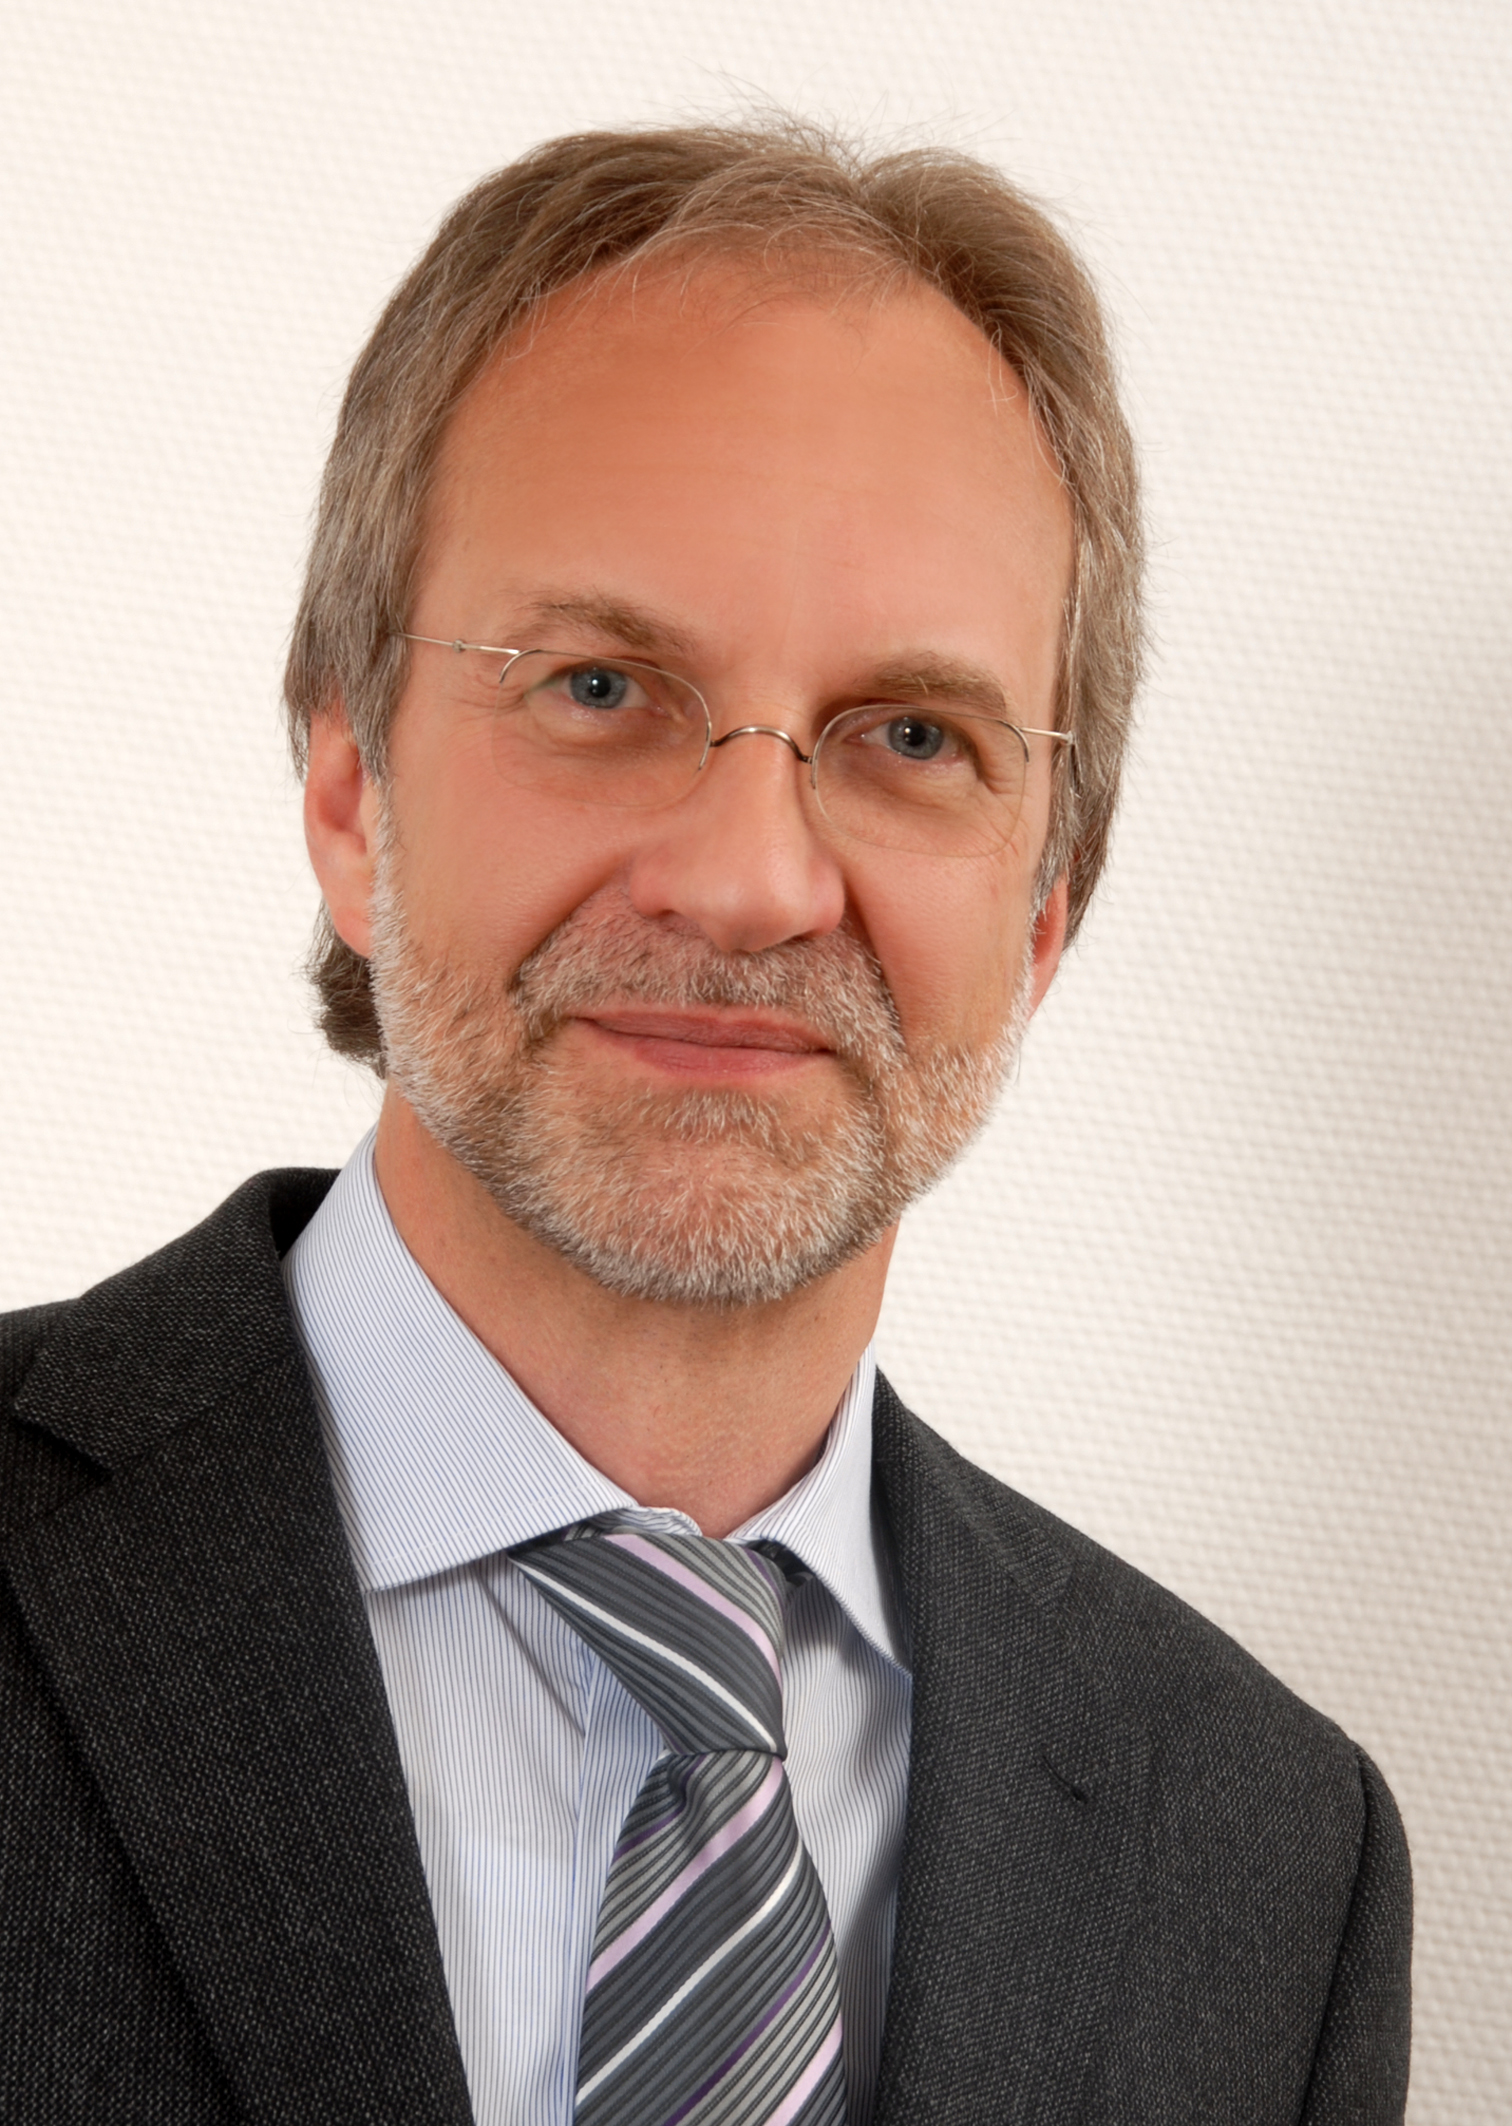 Detlev-Sven Neumann, Geschäftsführer, MHMedical Tec GmbH, Großostheim